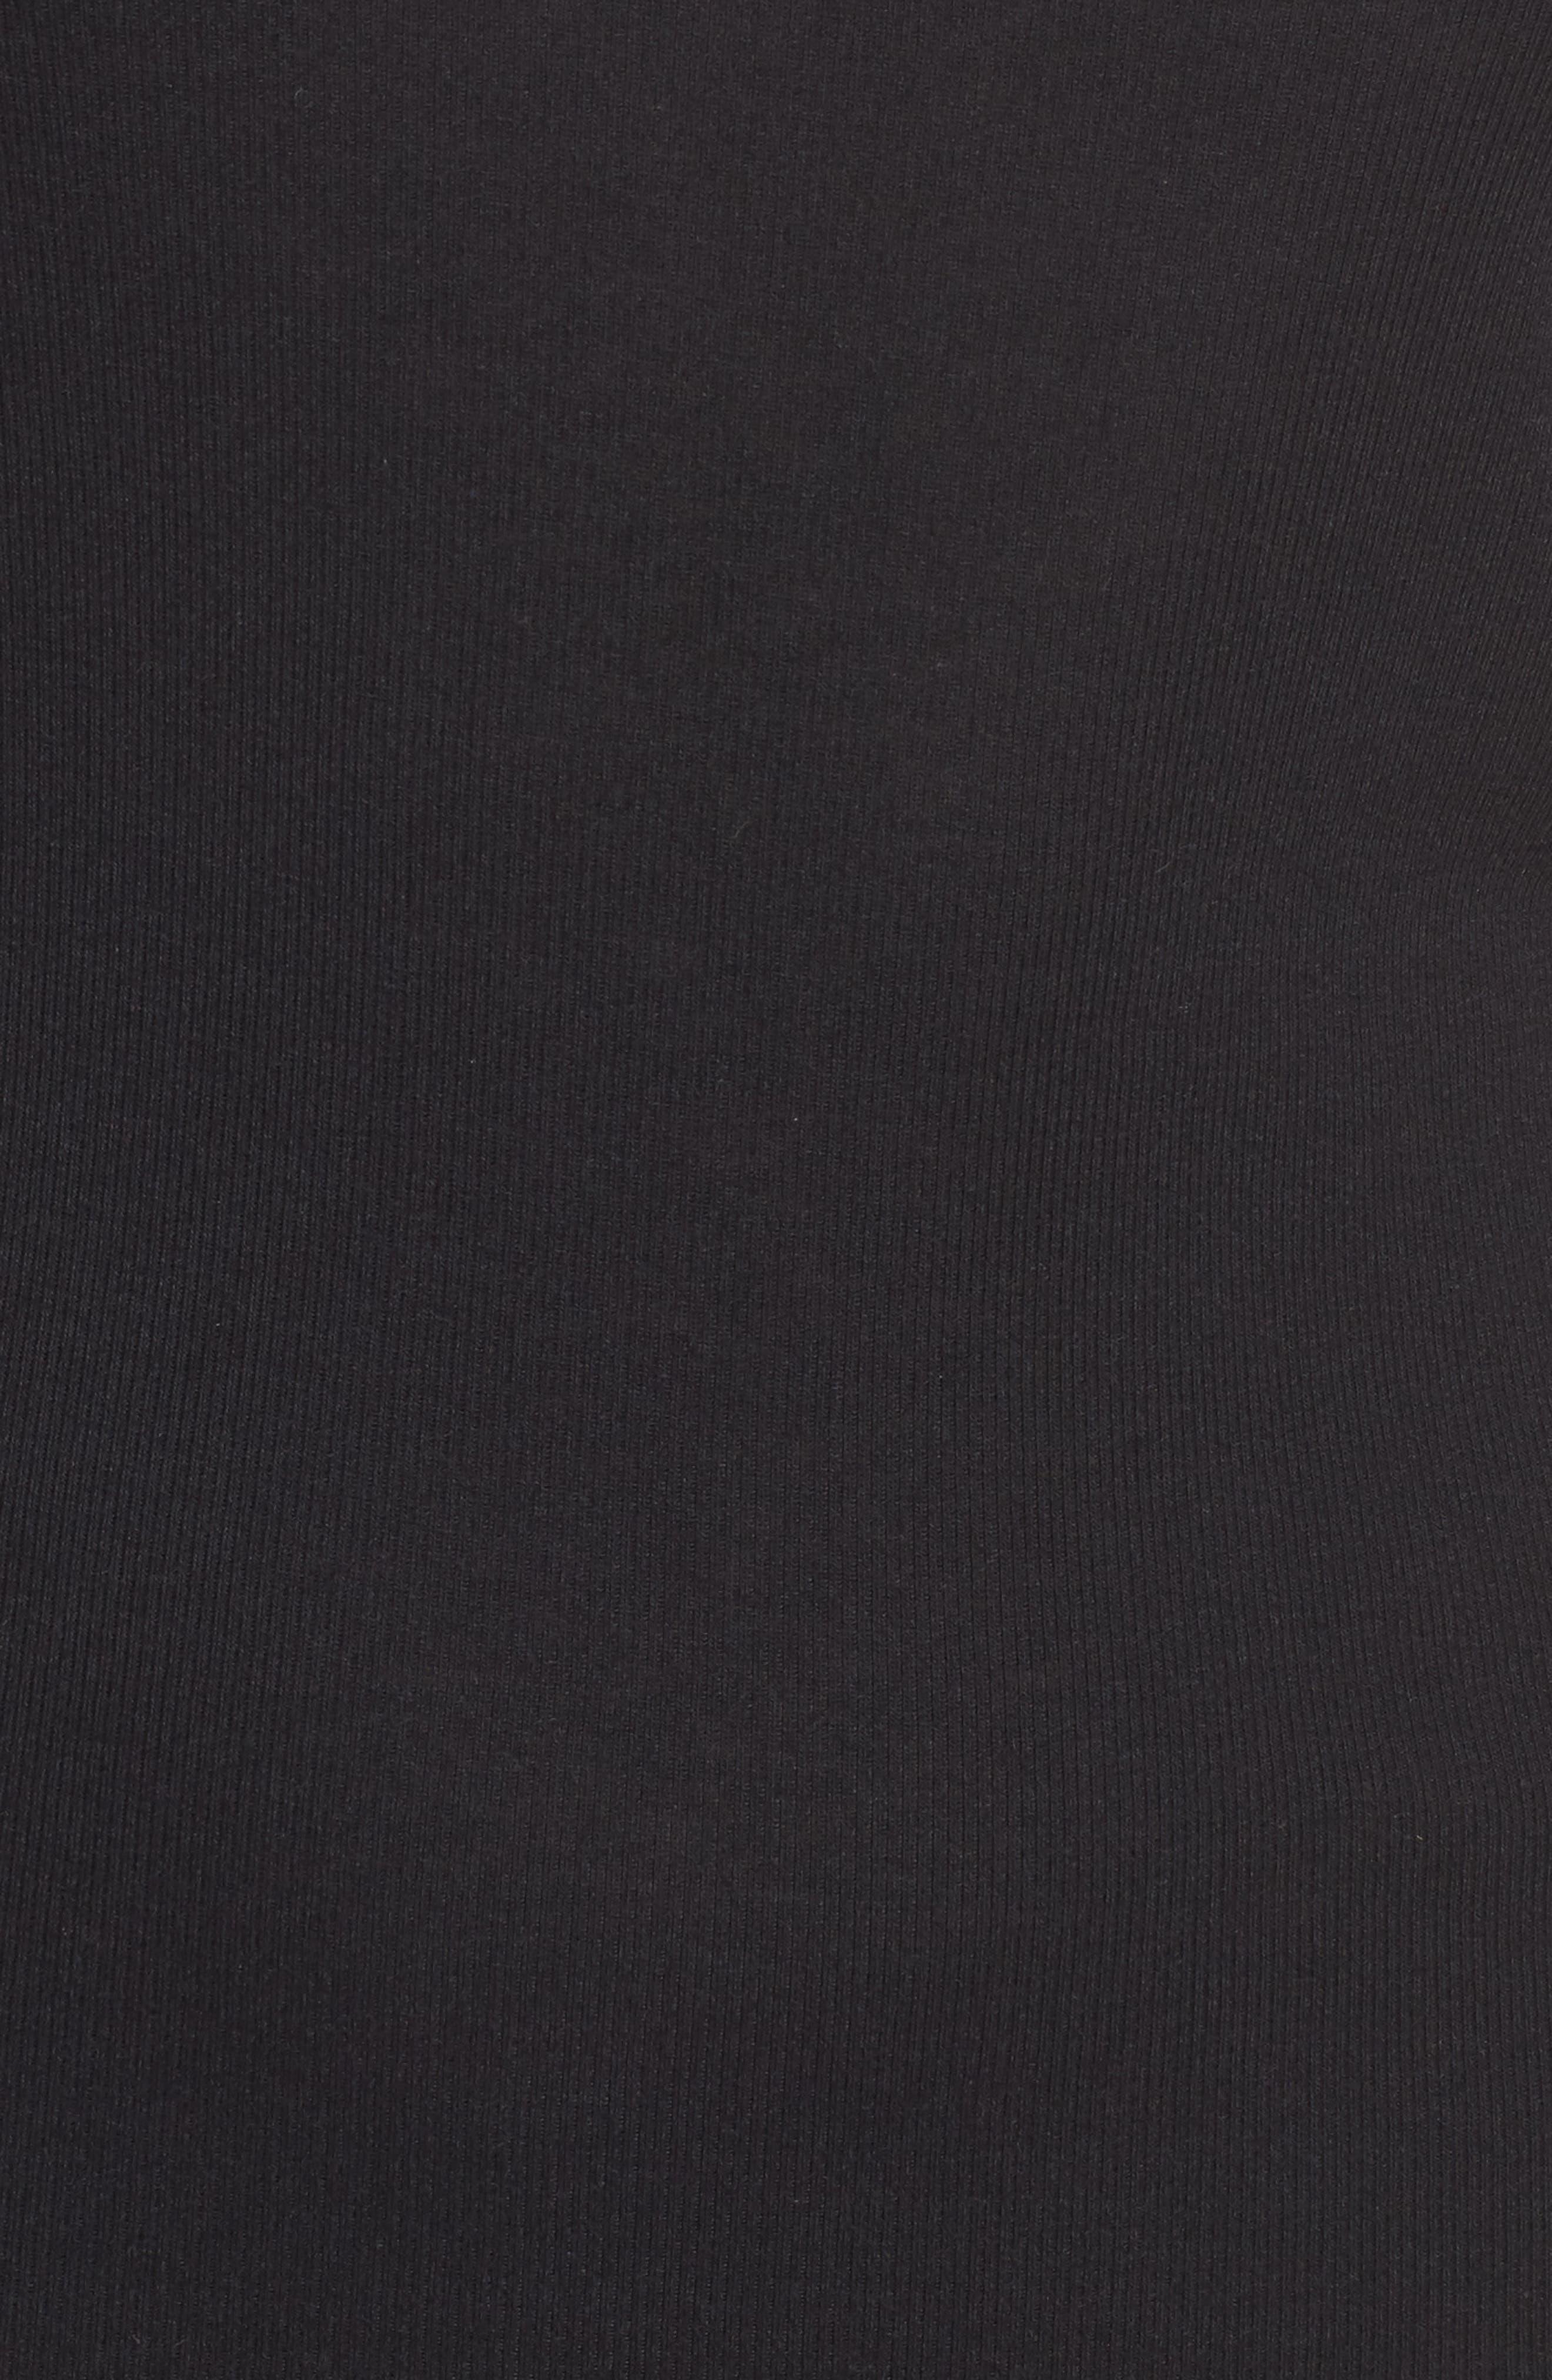 Crewneck Rib Knit Top,                             Alternate thumbnail 5, color,                             001